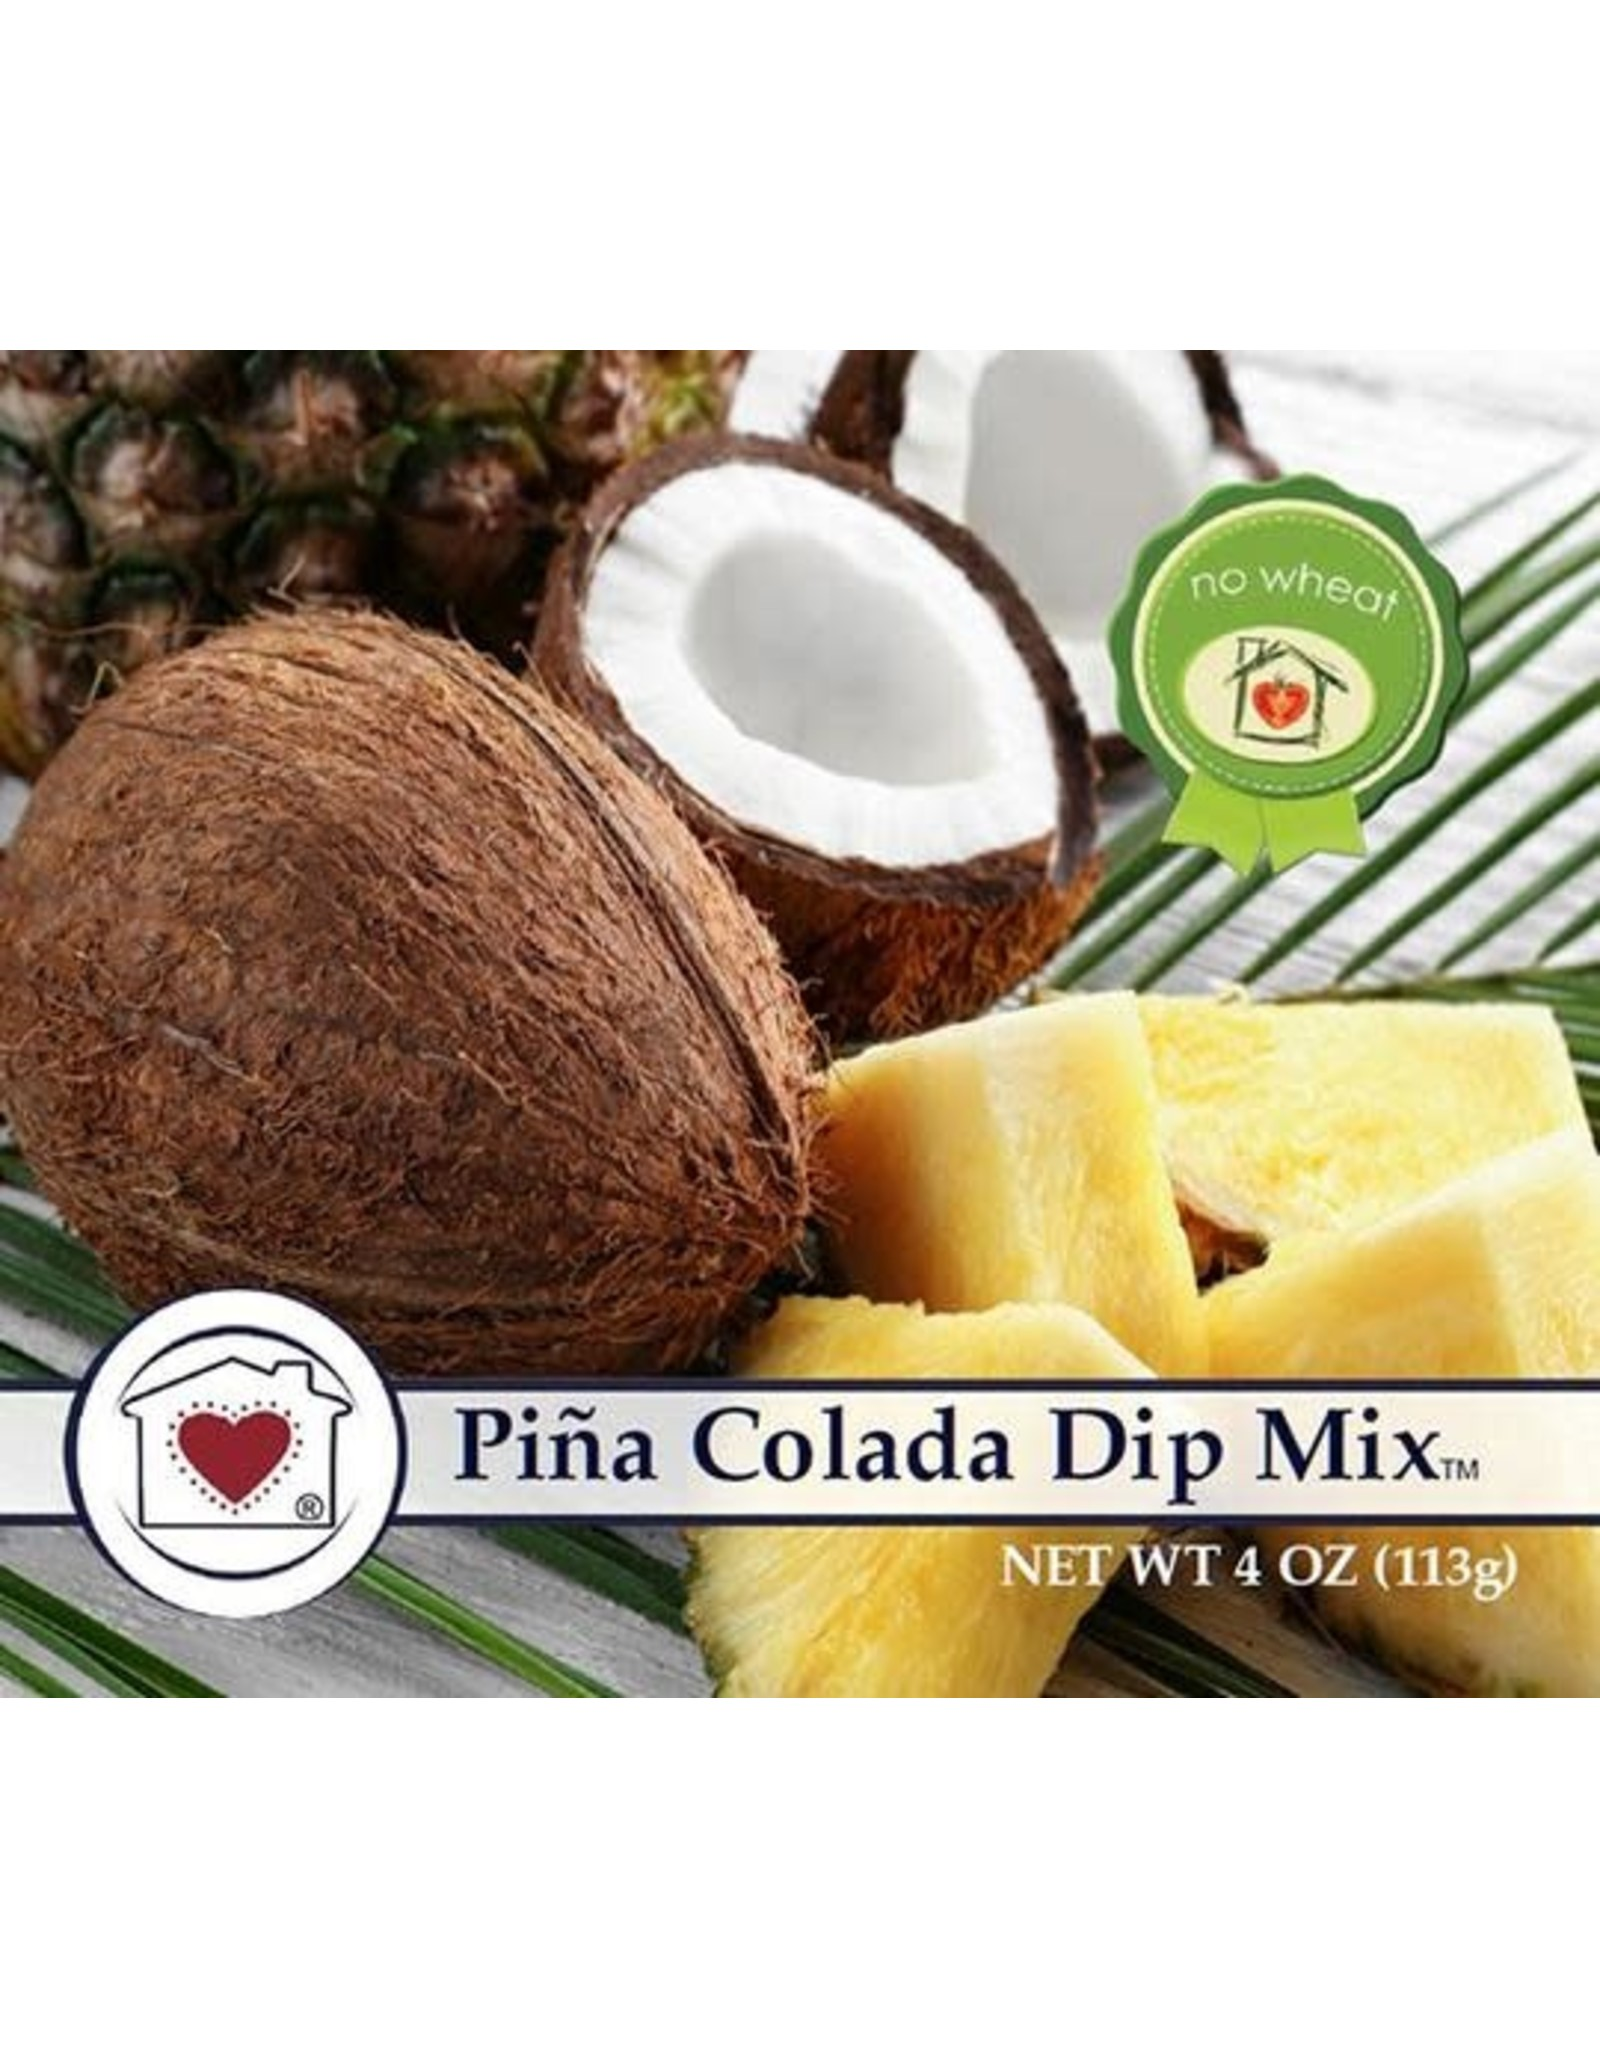 Country Home Creations Pina Colada Dip Mix, 4 oz